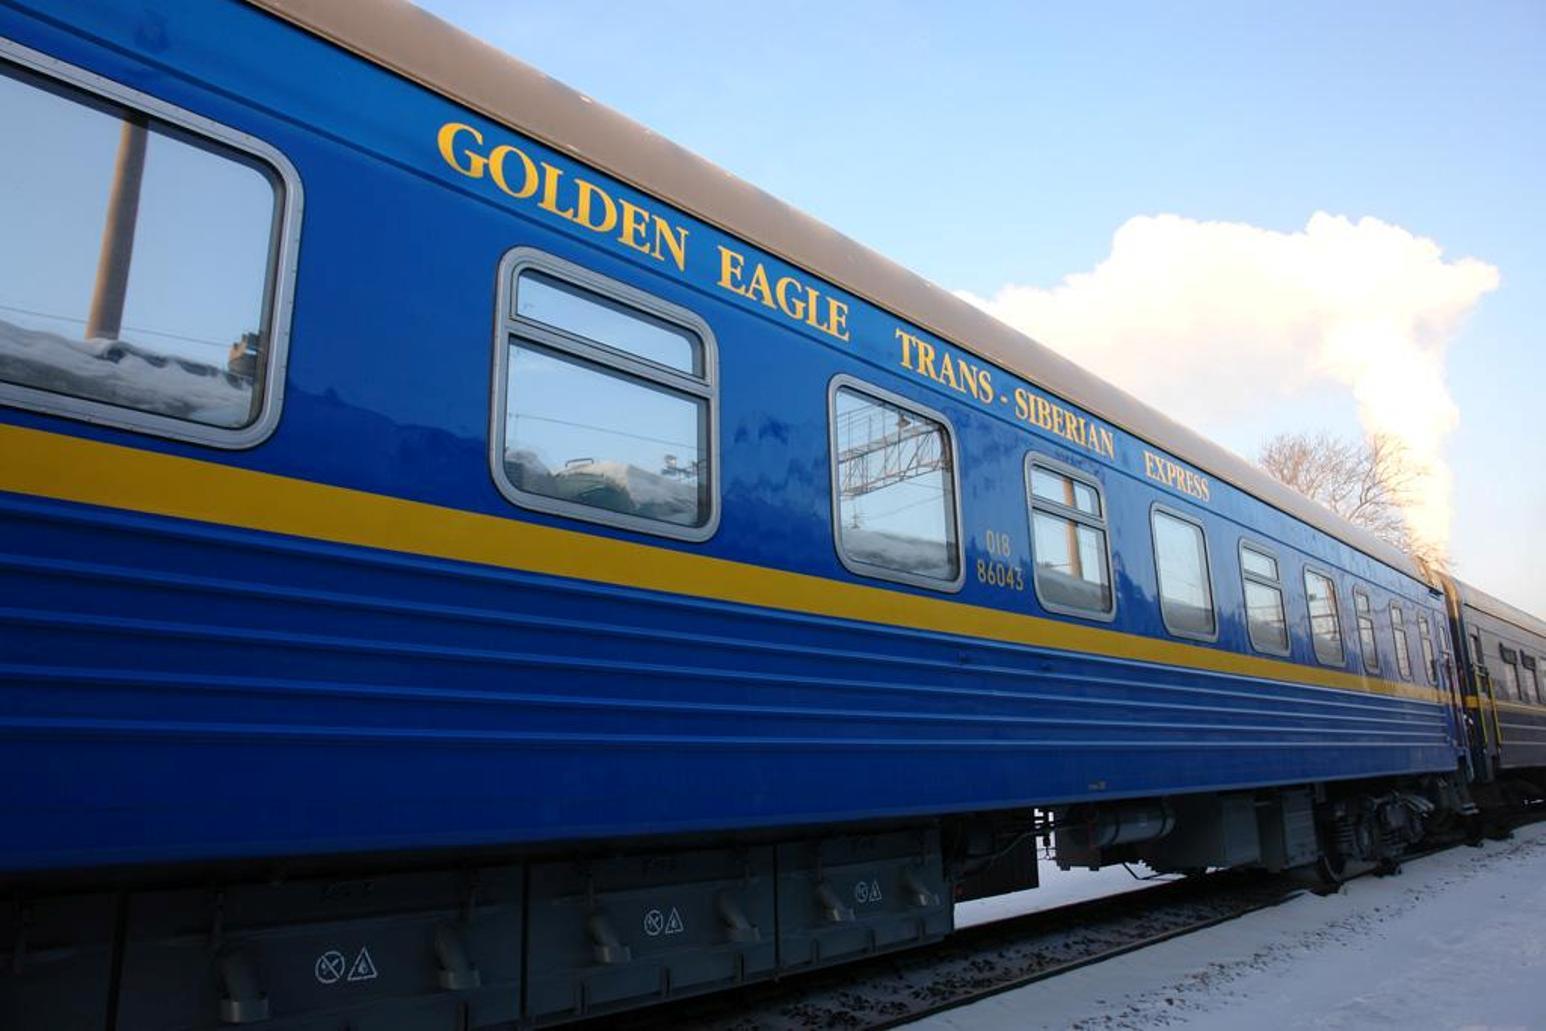 Golden Eagle Trans Siberian Express Exterior